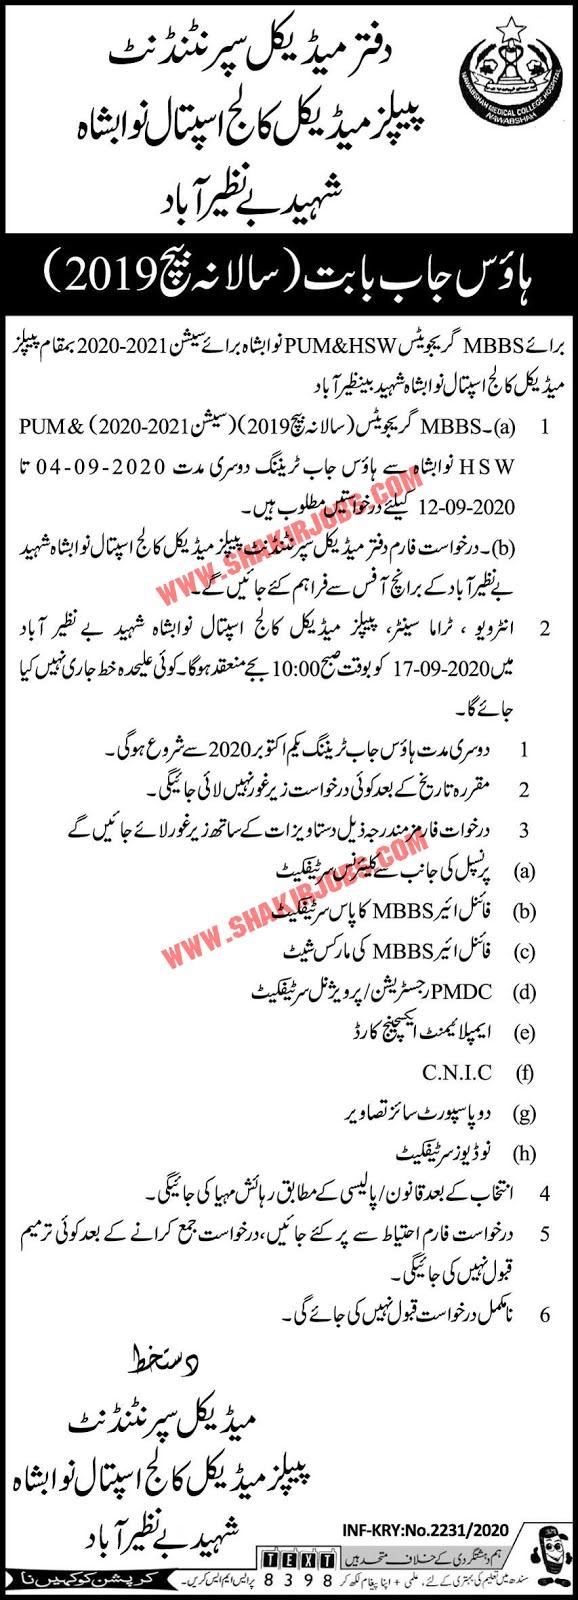 Jobs in Peoples Medical College Hospital Jobs September 2020 (250 Posts)